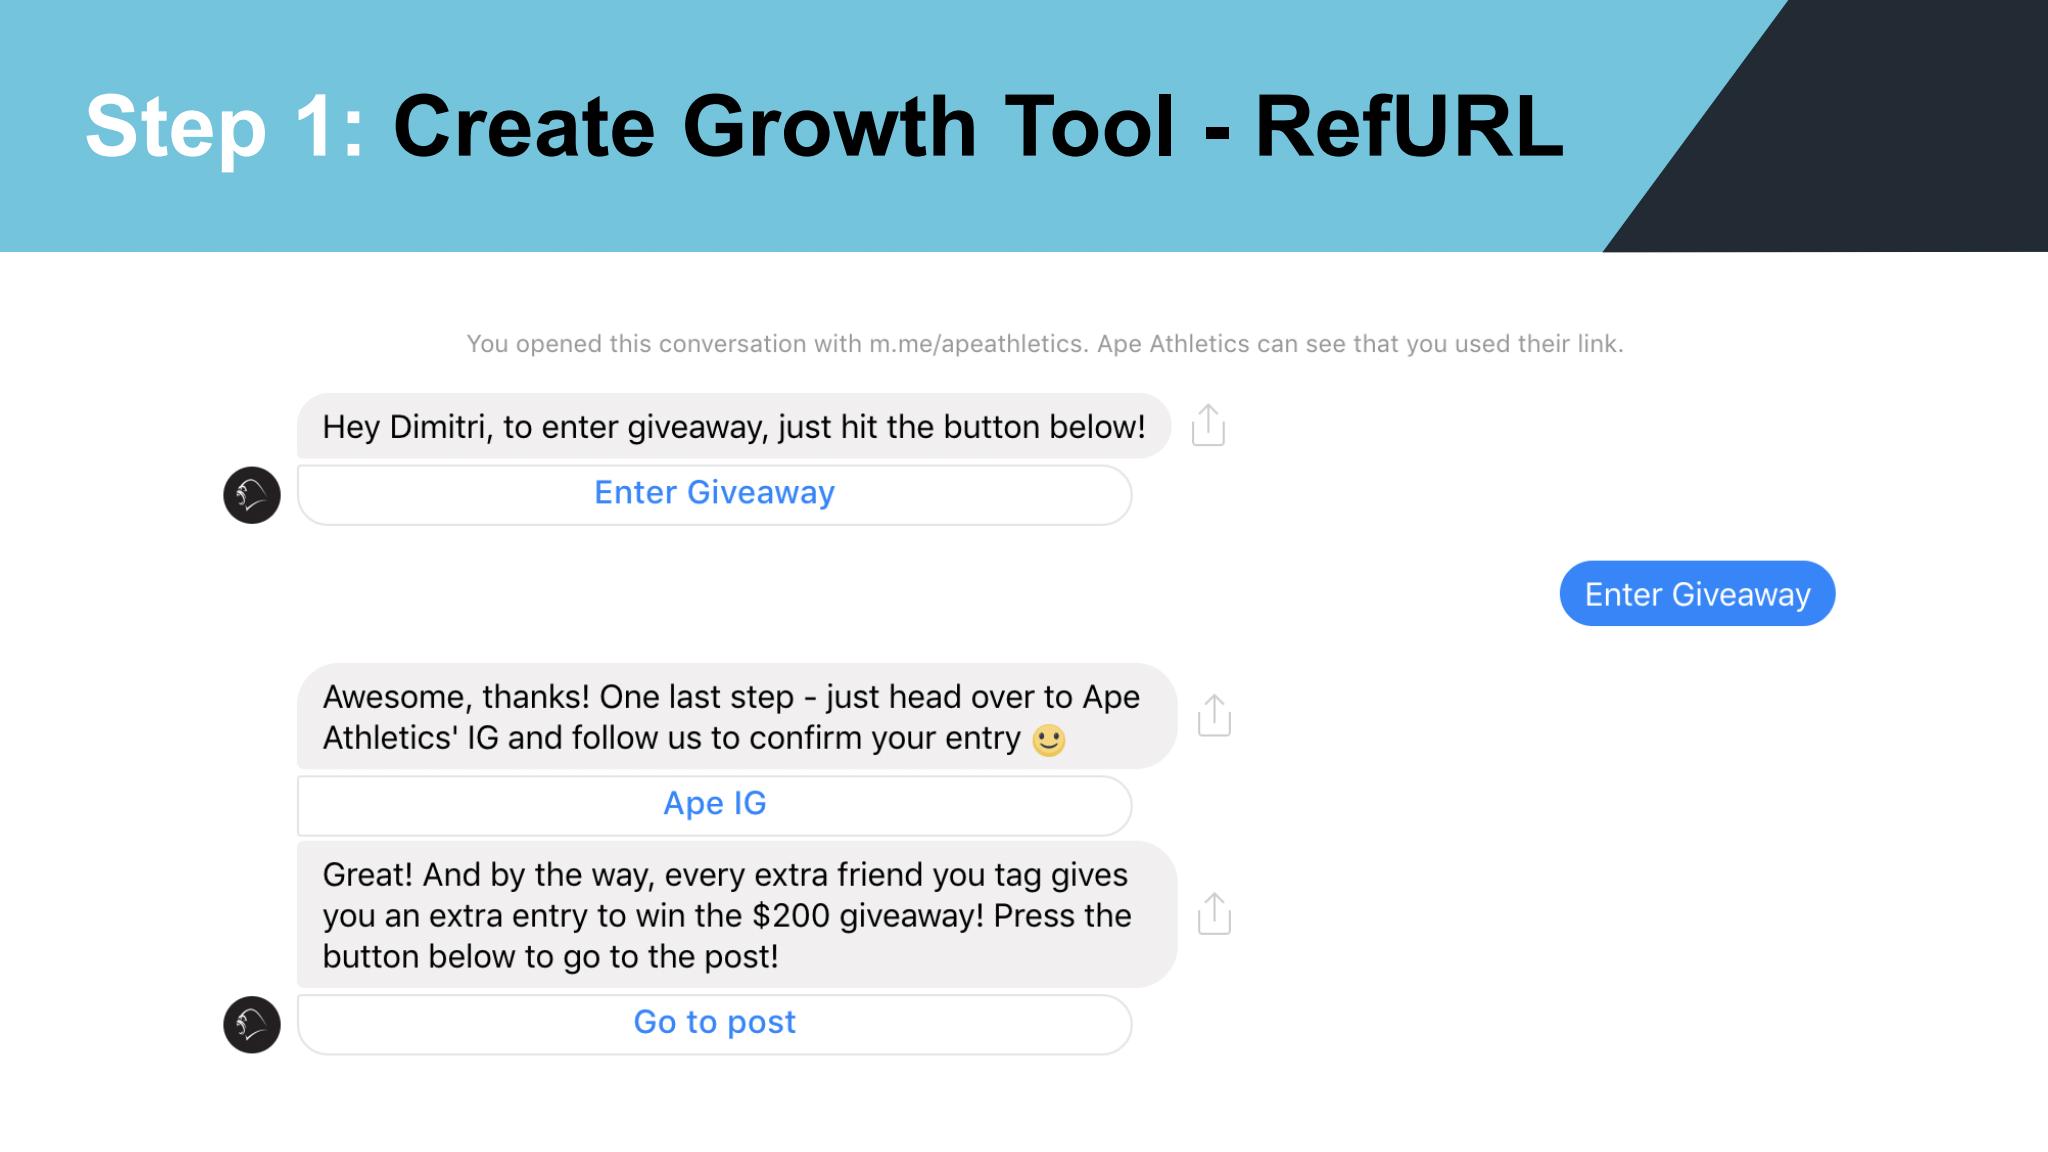 Dimitri Nikolakakis – Growth Tool